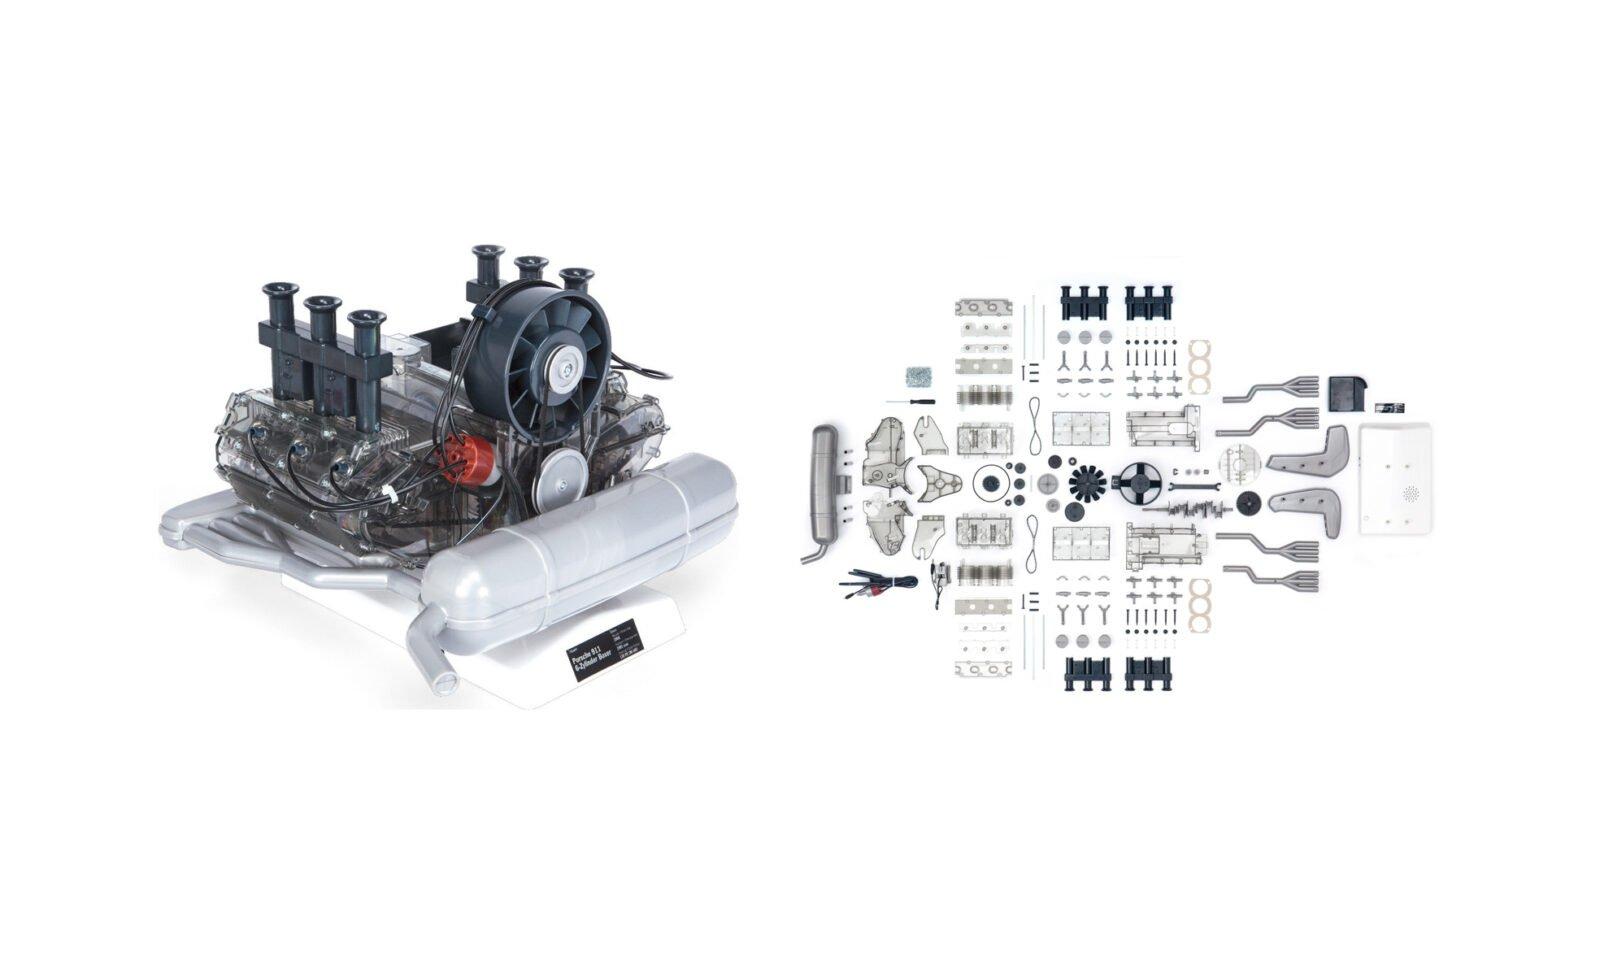 Porsche Flat 6 Engine Model 1600x961 - Porsche Flat-6 Engine 1:4 Scale Model